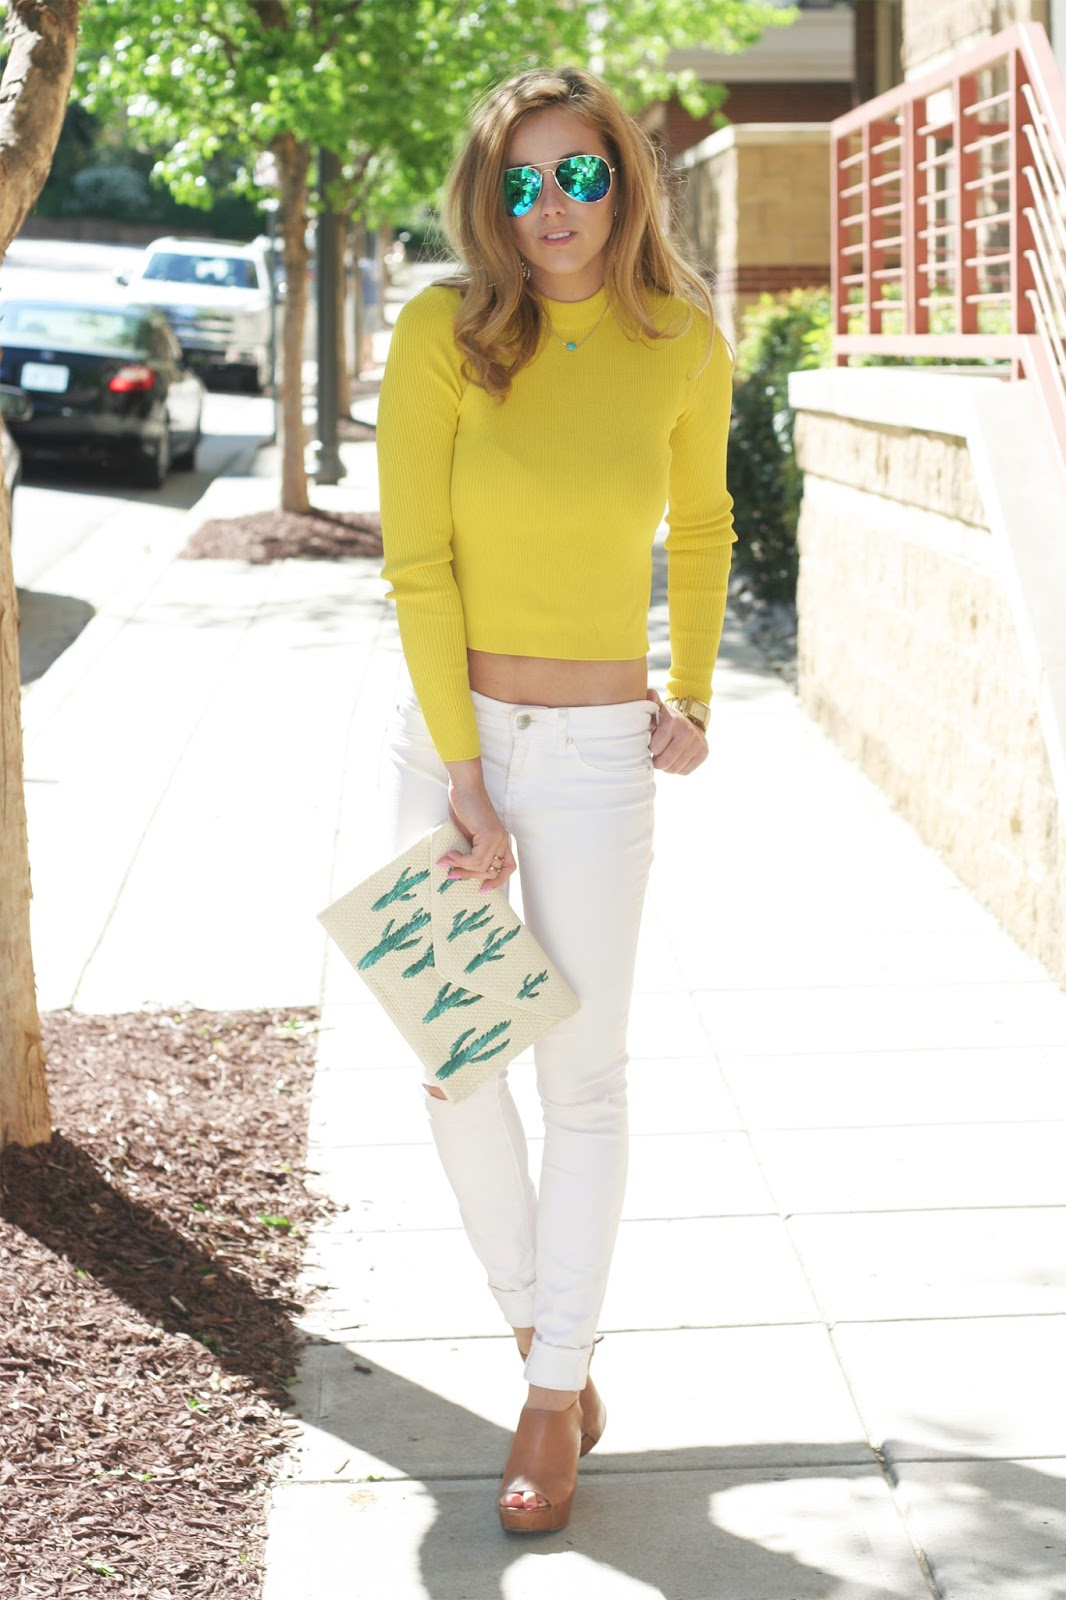 Effortless-fashion-blogger-pose-sponsorship-street-style